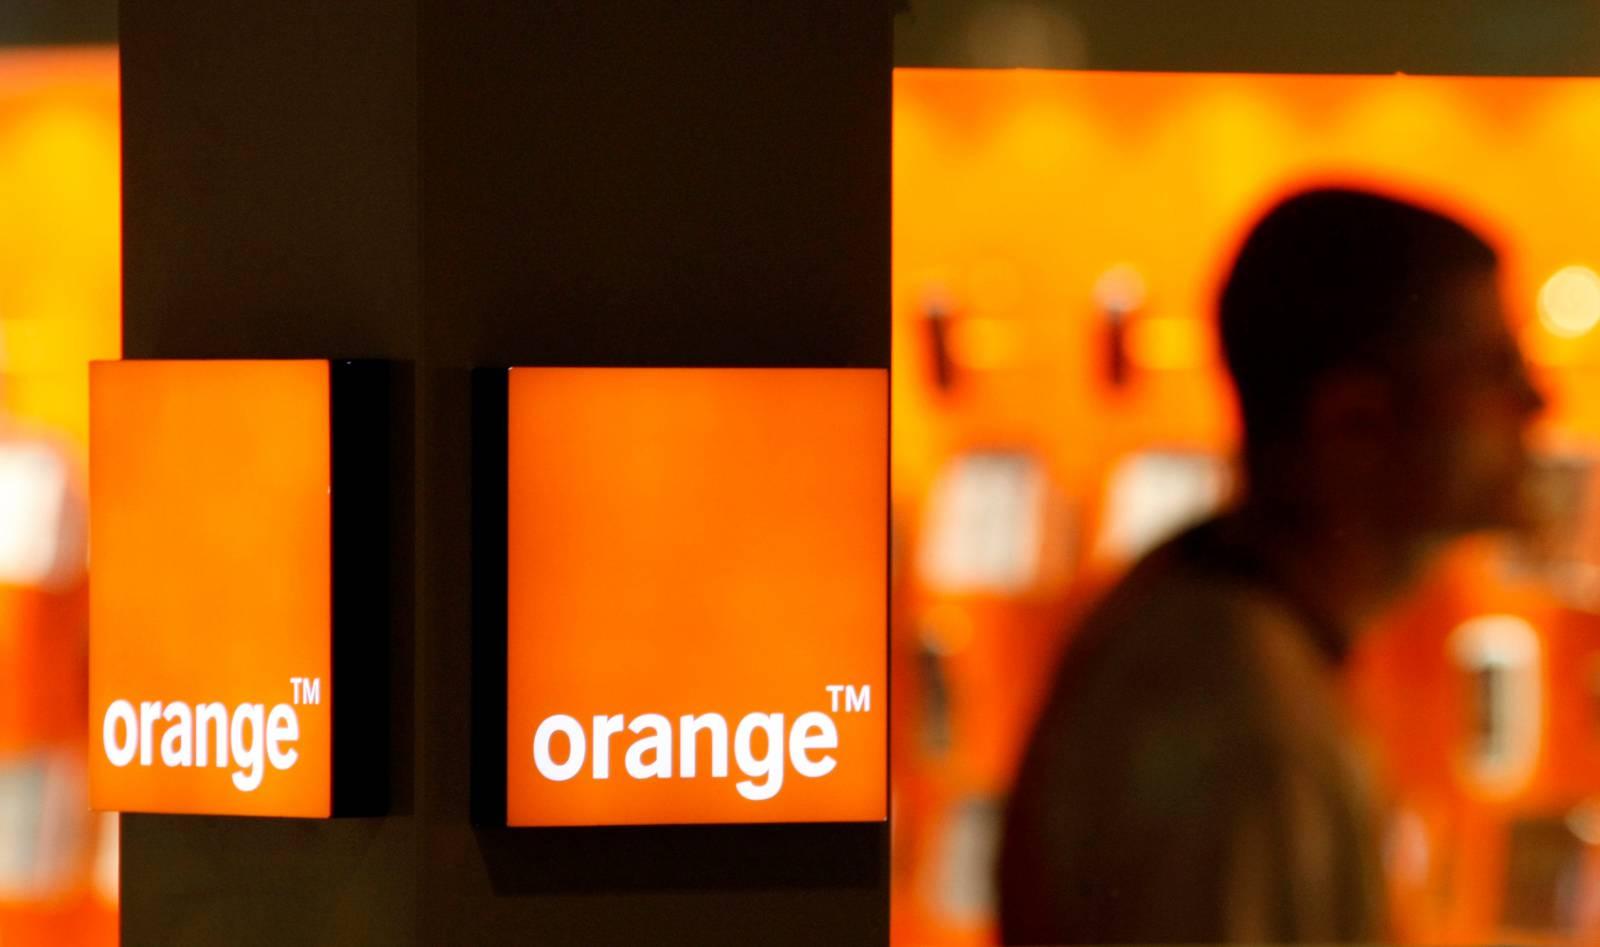 Orange. Telefoane IEFTINE cu NOI Reduceri Oferite Astazi in Romania